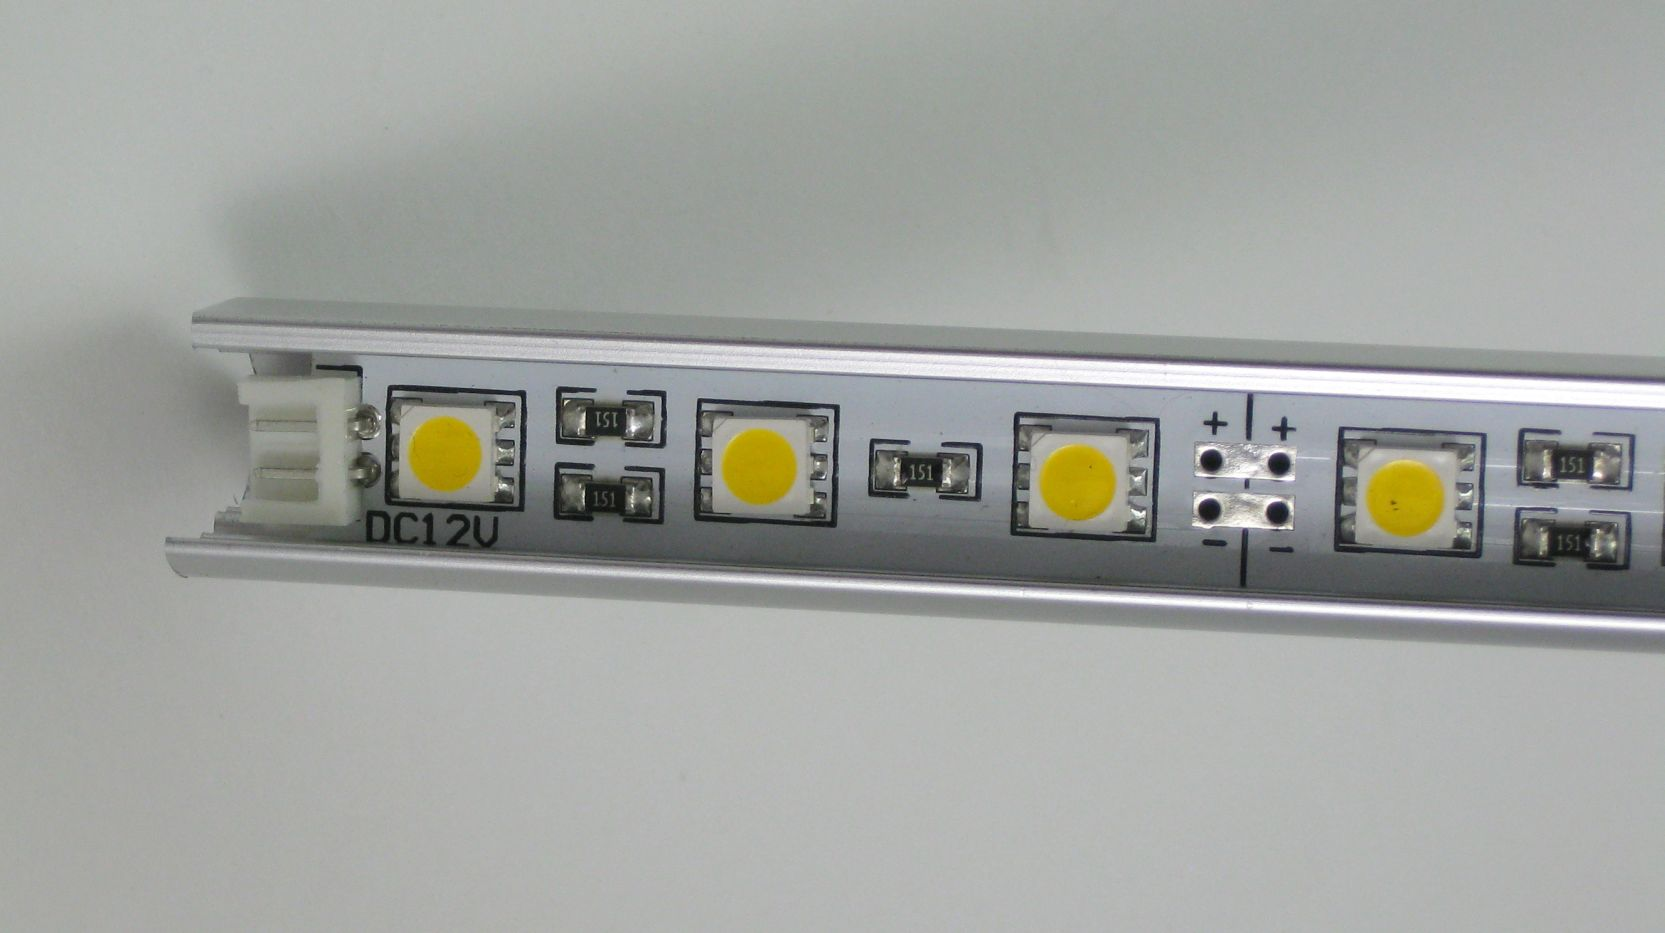 Rein weiß 3Chip LED Leiste 12V 30 x 0,22W in Alu Profil